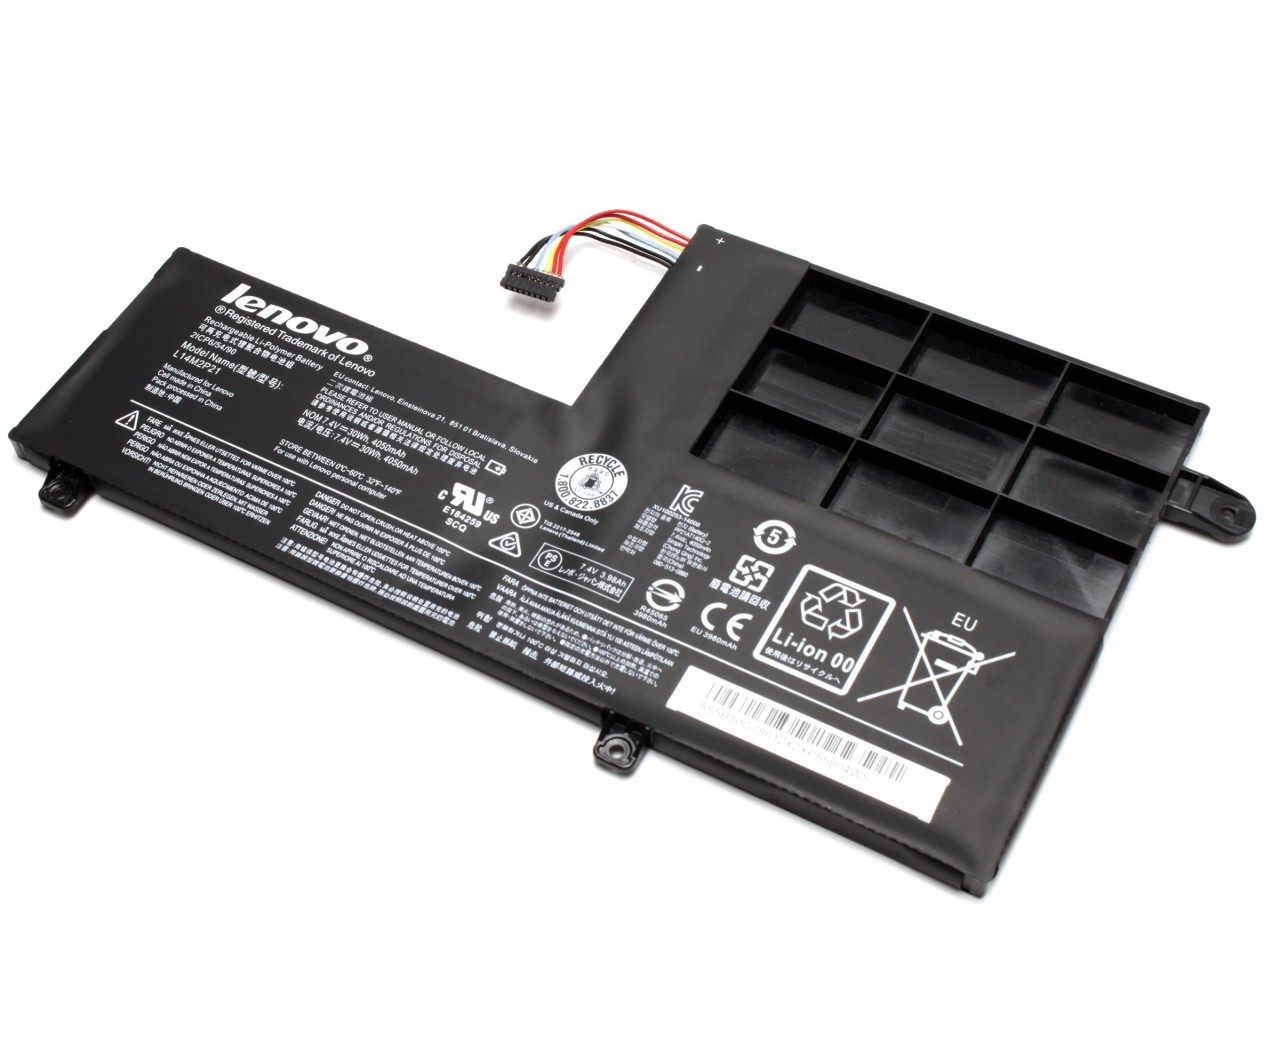 Baterie Lenovo IdeaPad 310S-14ISK Originala 30Wh/4050mAh 2 celule imagine powerlaptop.ro 2021